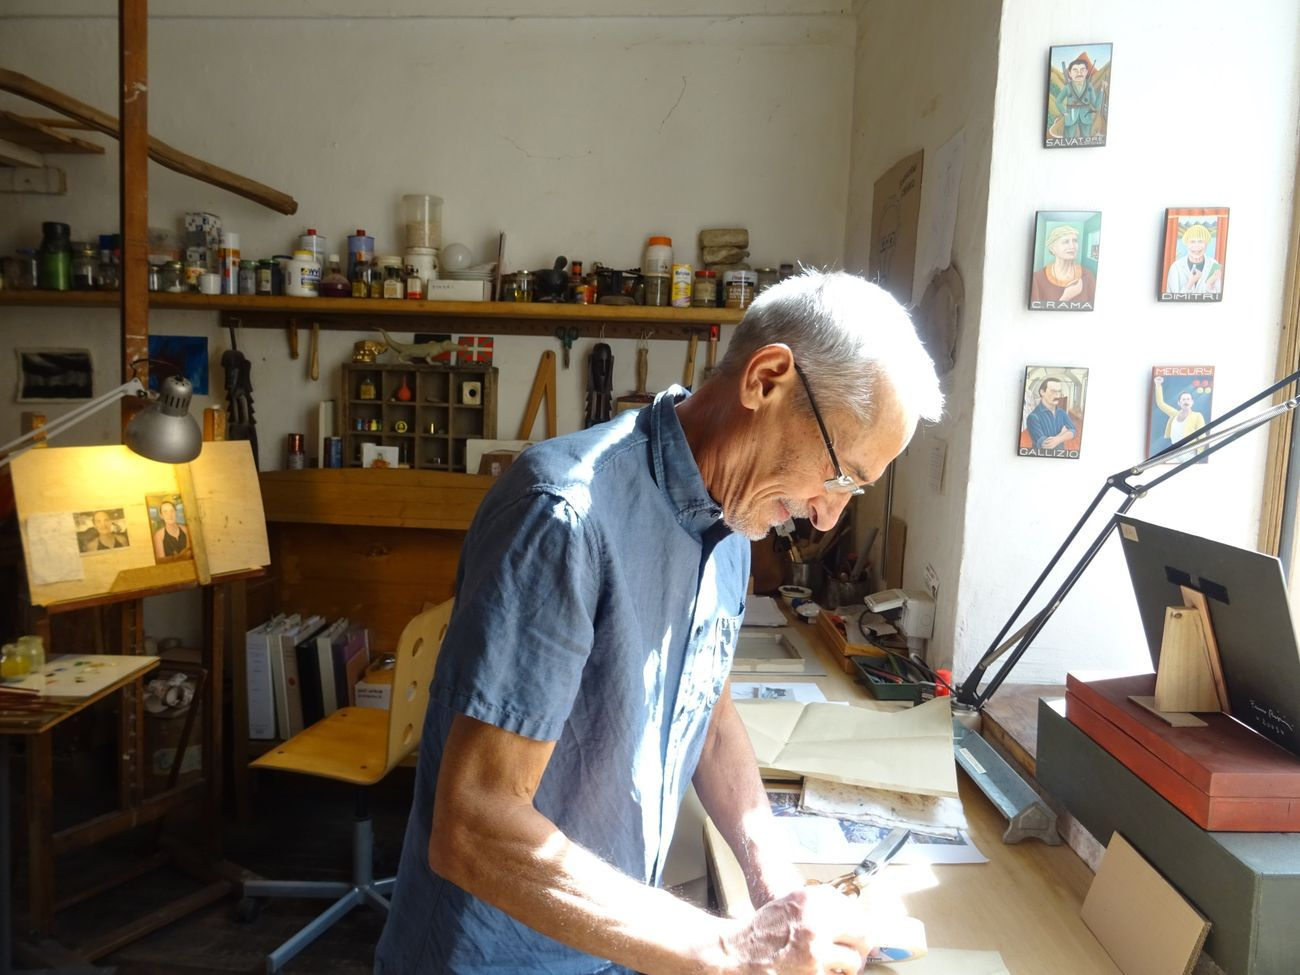 Franco Biagioni nel suo studio, Cuneo, luglio 2019, photo Luca Arnaudo